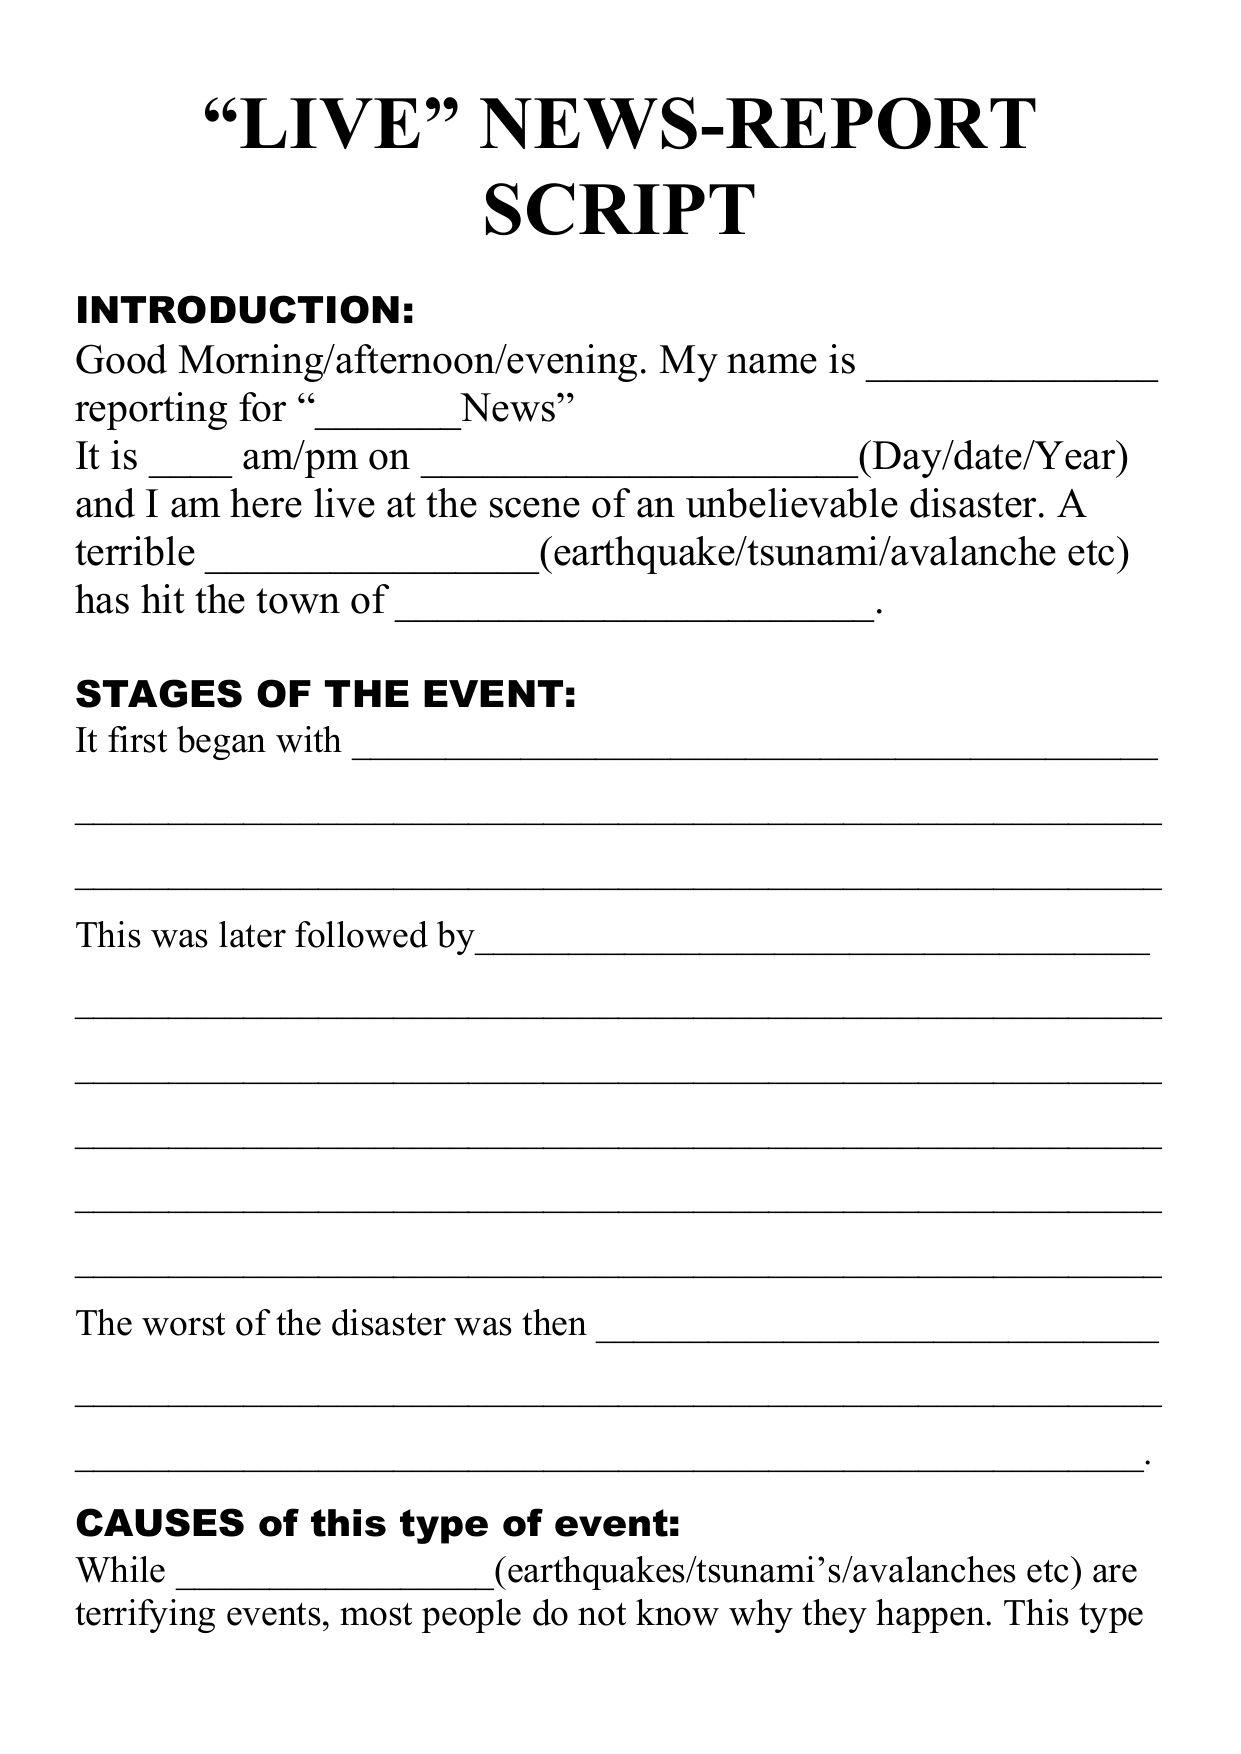 The Cool Natural Disaster Live Newsreport Script Template Regarding News Report Template Digital Photograph Book Report Templates Report Template Book Report [ 1754 x 1241 Pixel ]